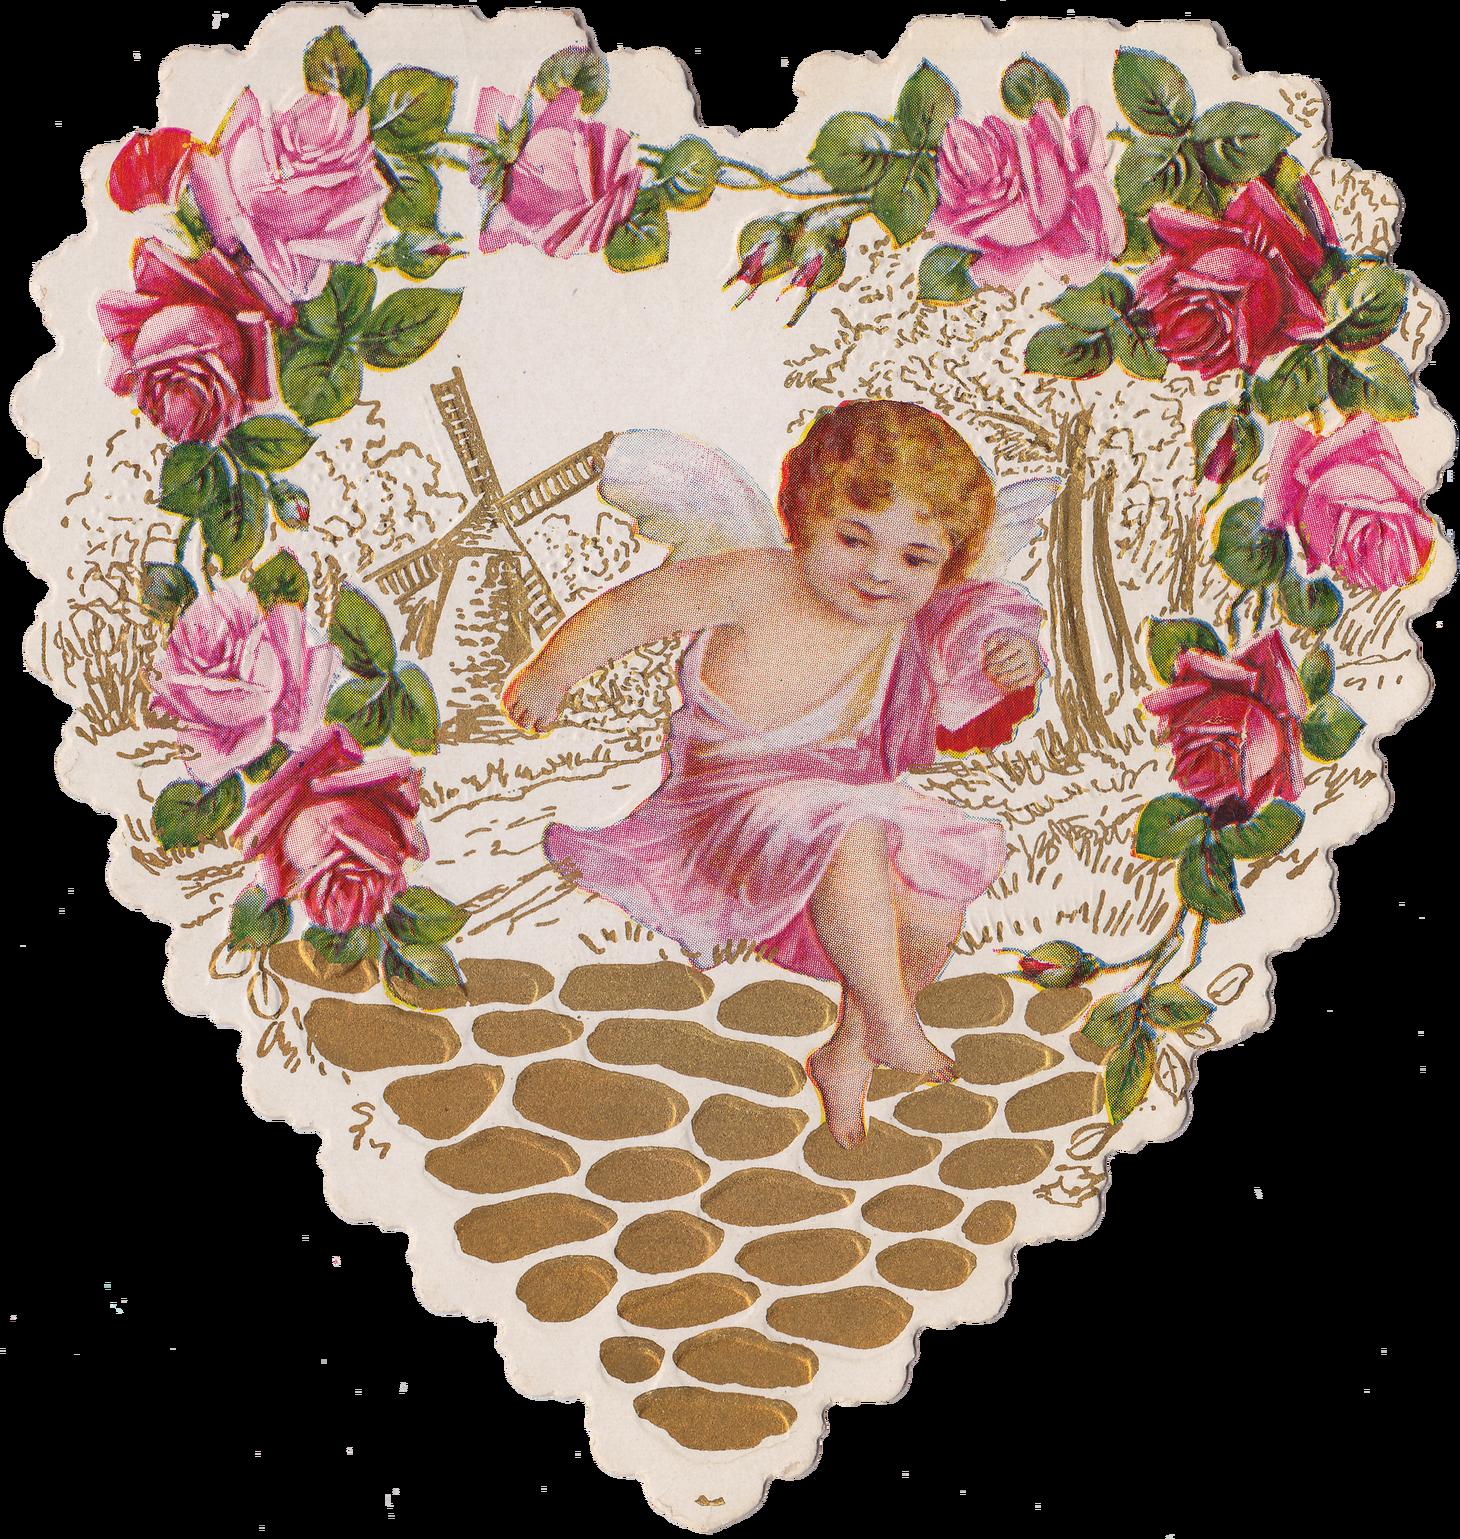 Cut Rose Heart With Cherub Amp Dear Friend Poem